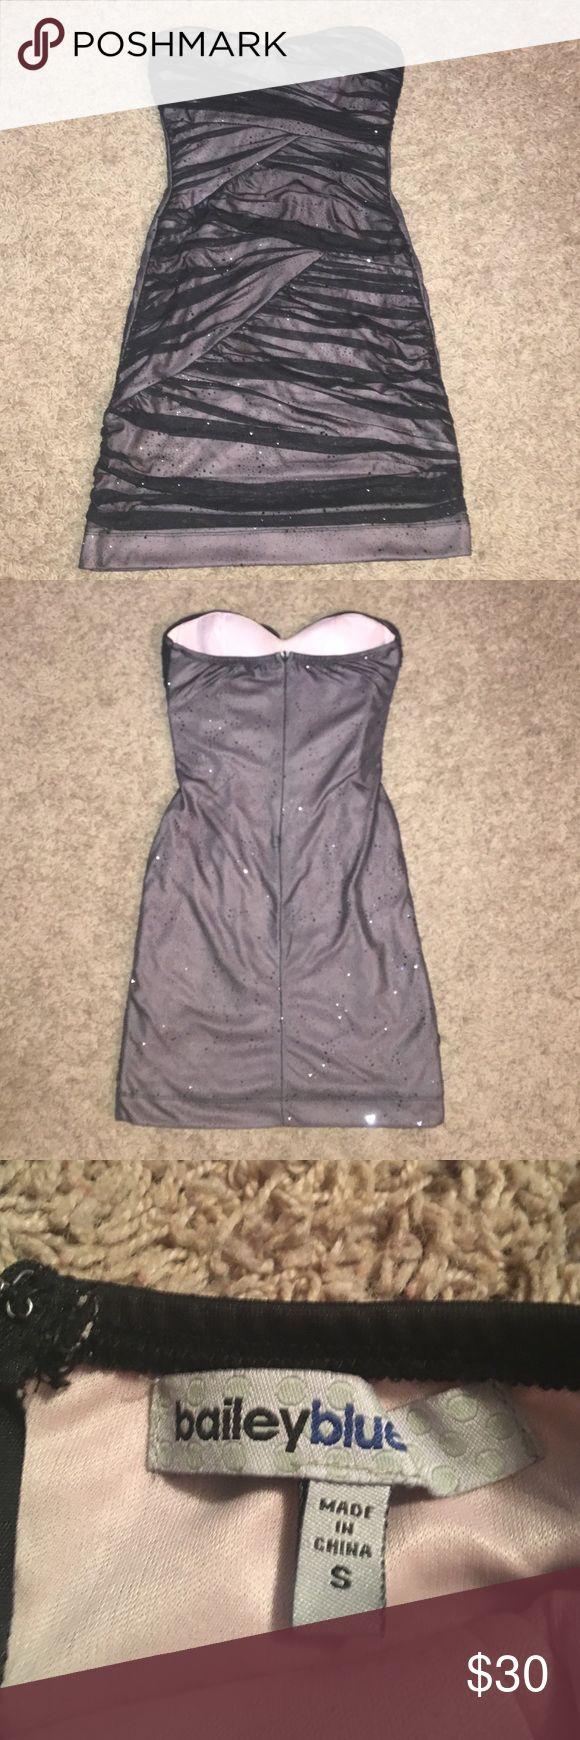 Semi Formal Dress Worn Once Size S From Von Maur Baileyblue Dresses Strapless Semi Formal Dresses Semi Formal Wearing Dress [ 1740 x 580 Pixel ]